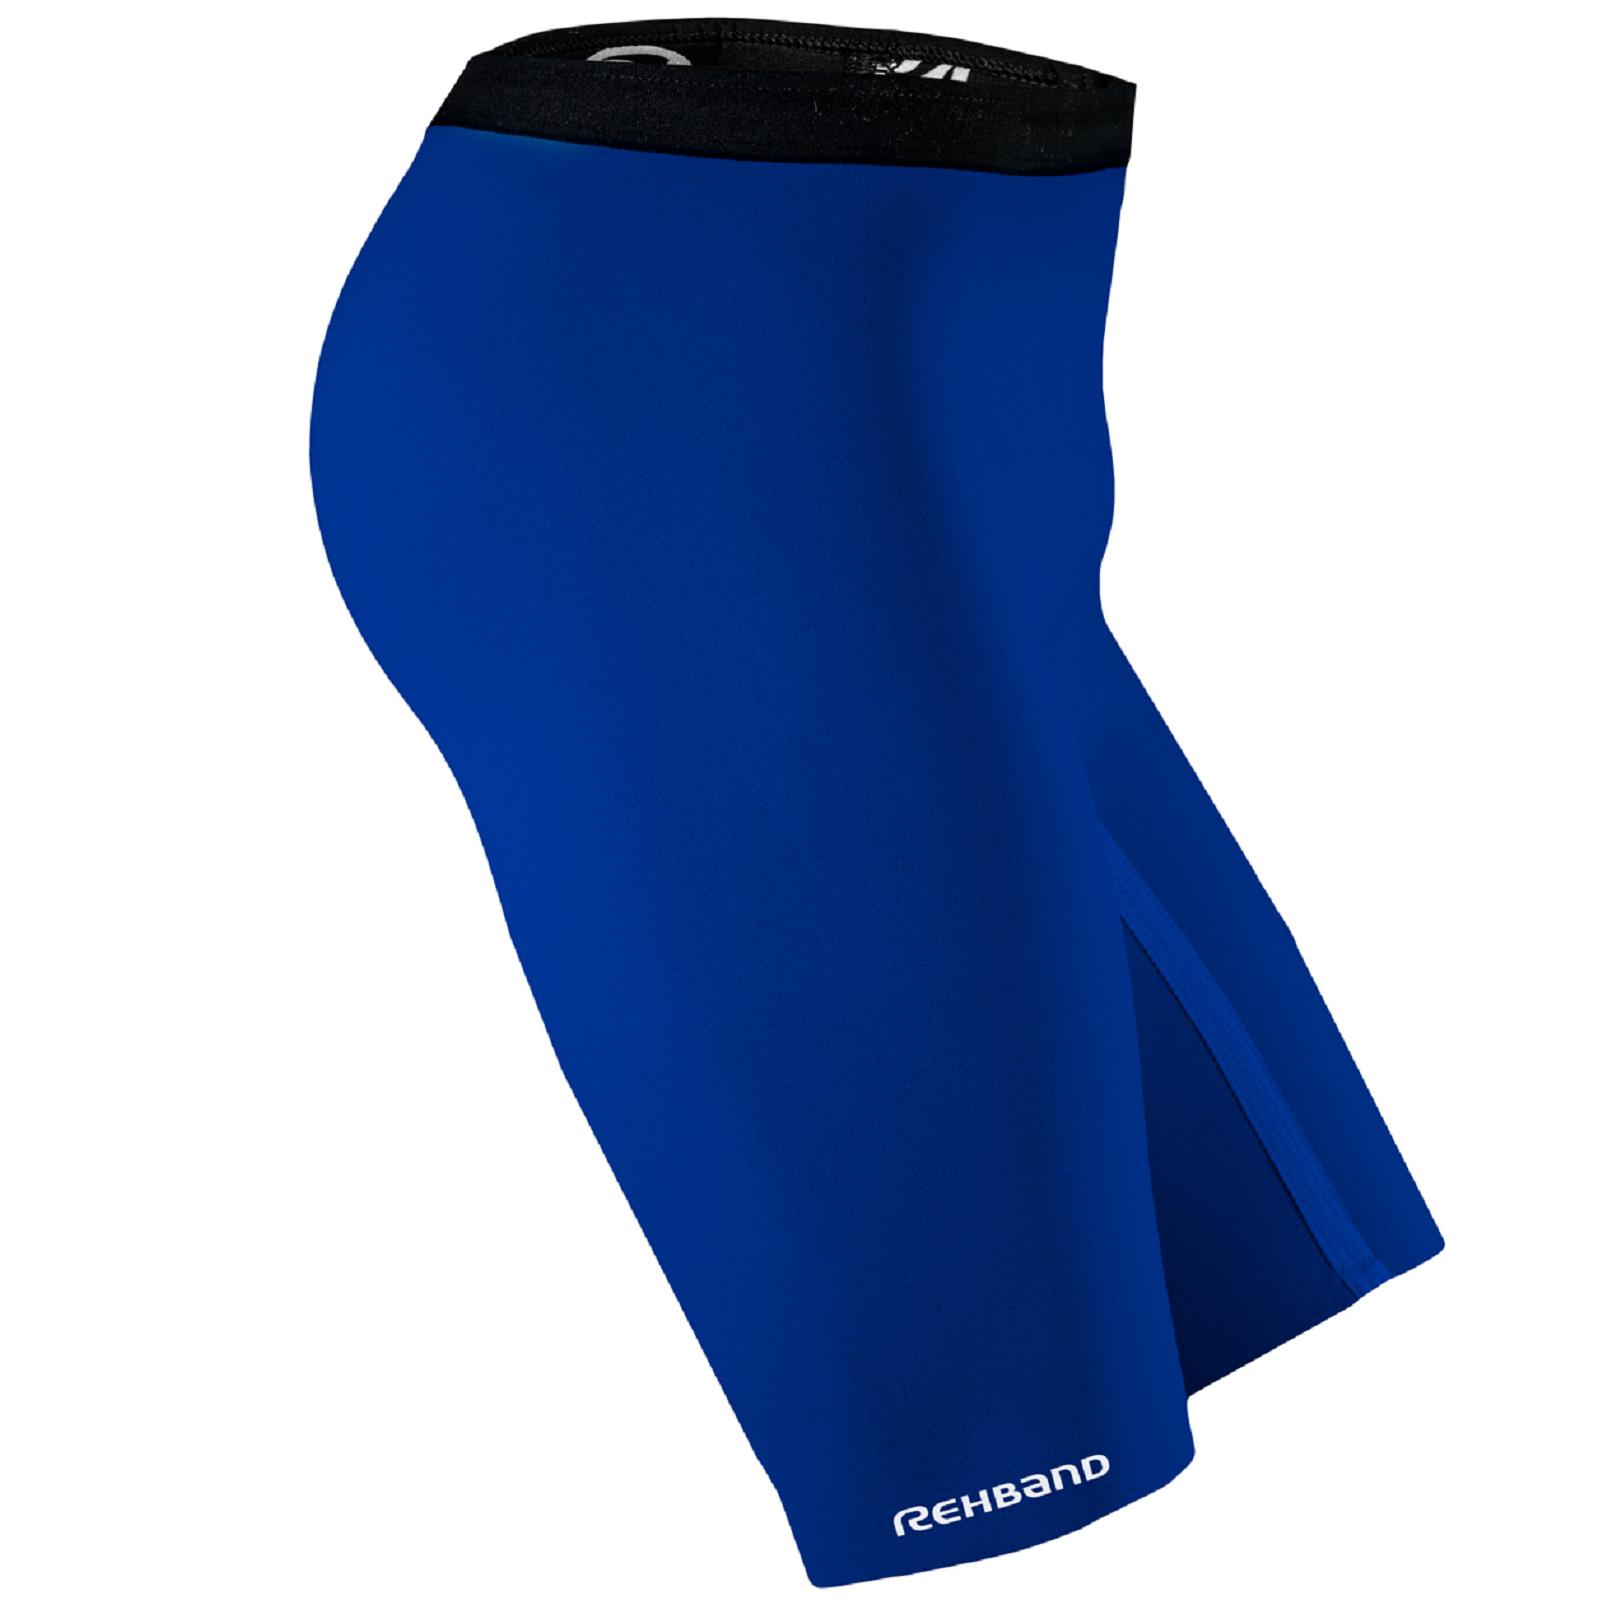 Rehband QD Thermal Zone Shorts Herren Kompressions Hose Sporthose blau 804103